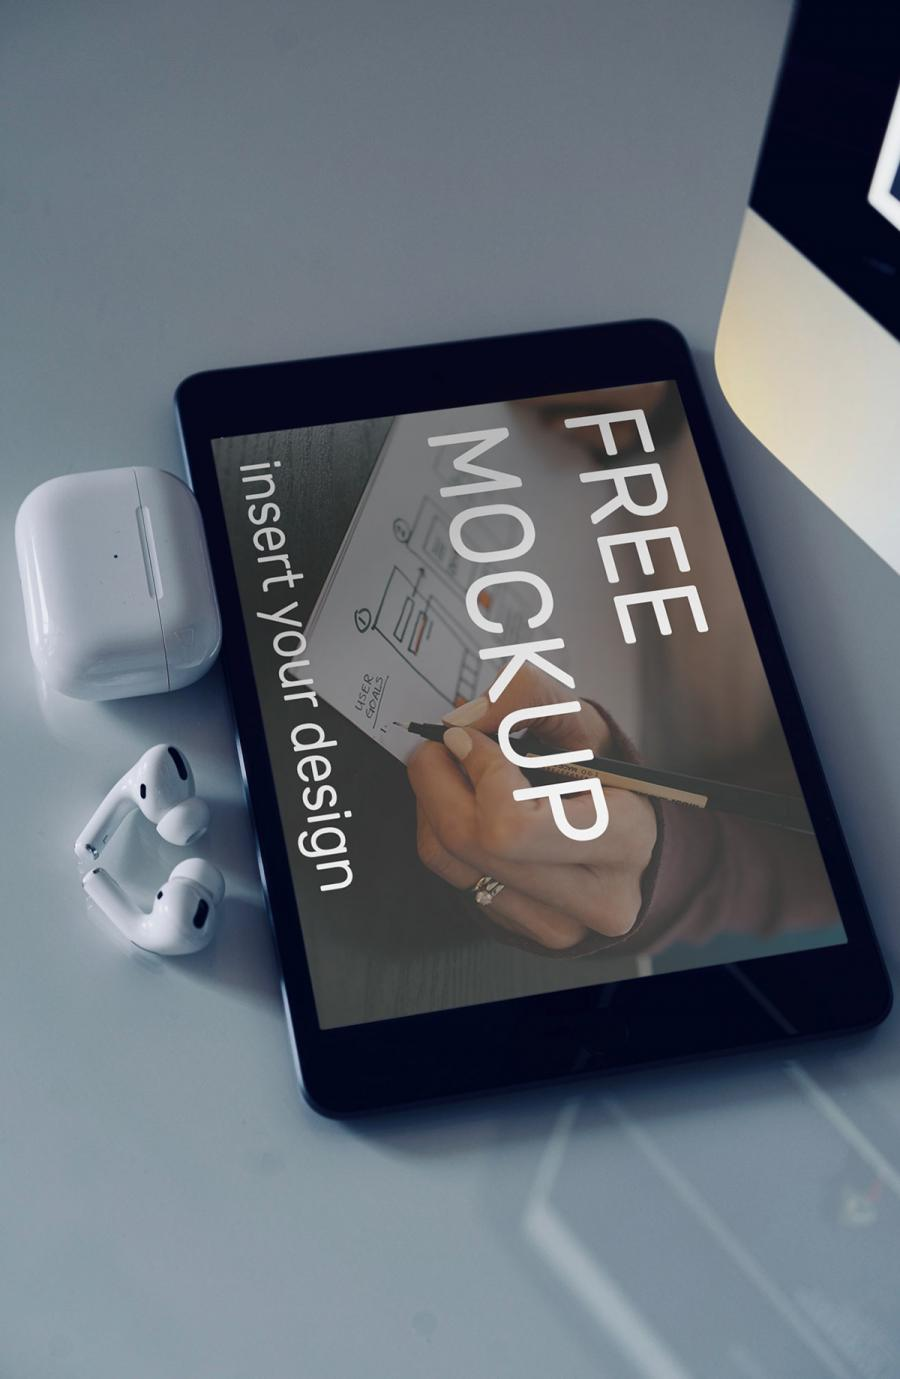 iPad with Airpods Free PSD Mockup